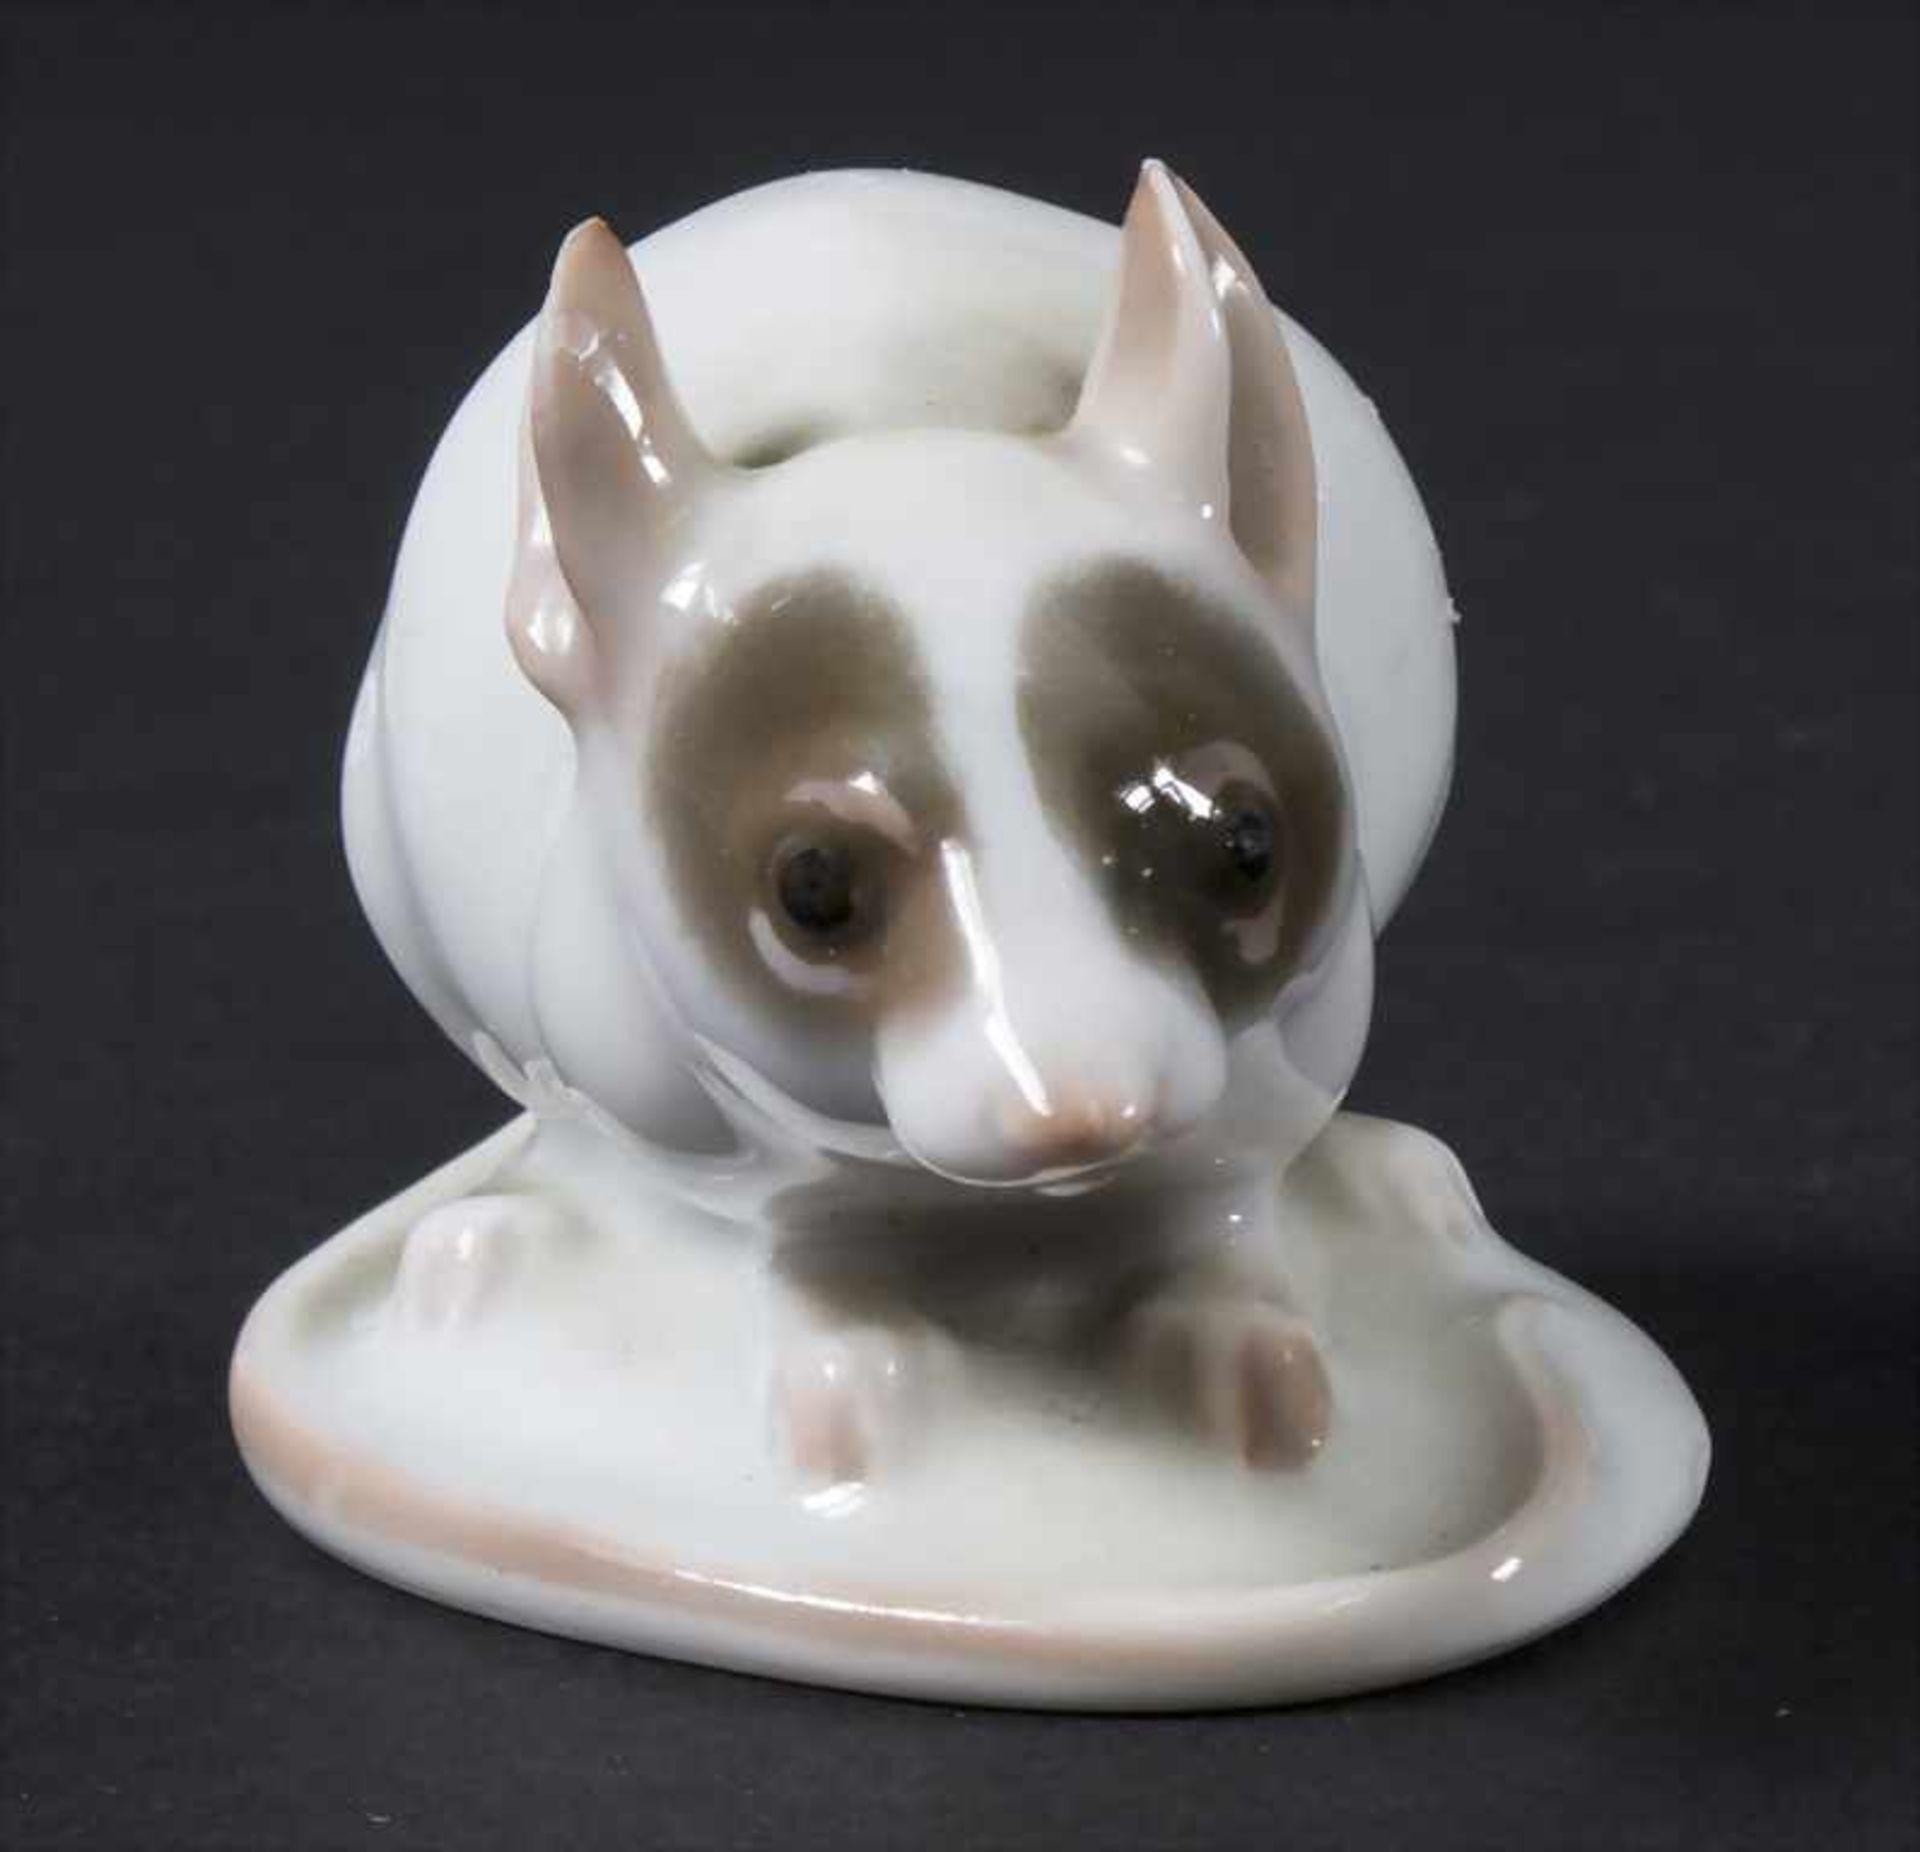 Maus / A mouse, Rosenthal, Selb, um 1930 - Bild 2 aus 3